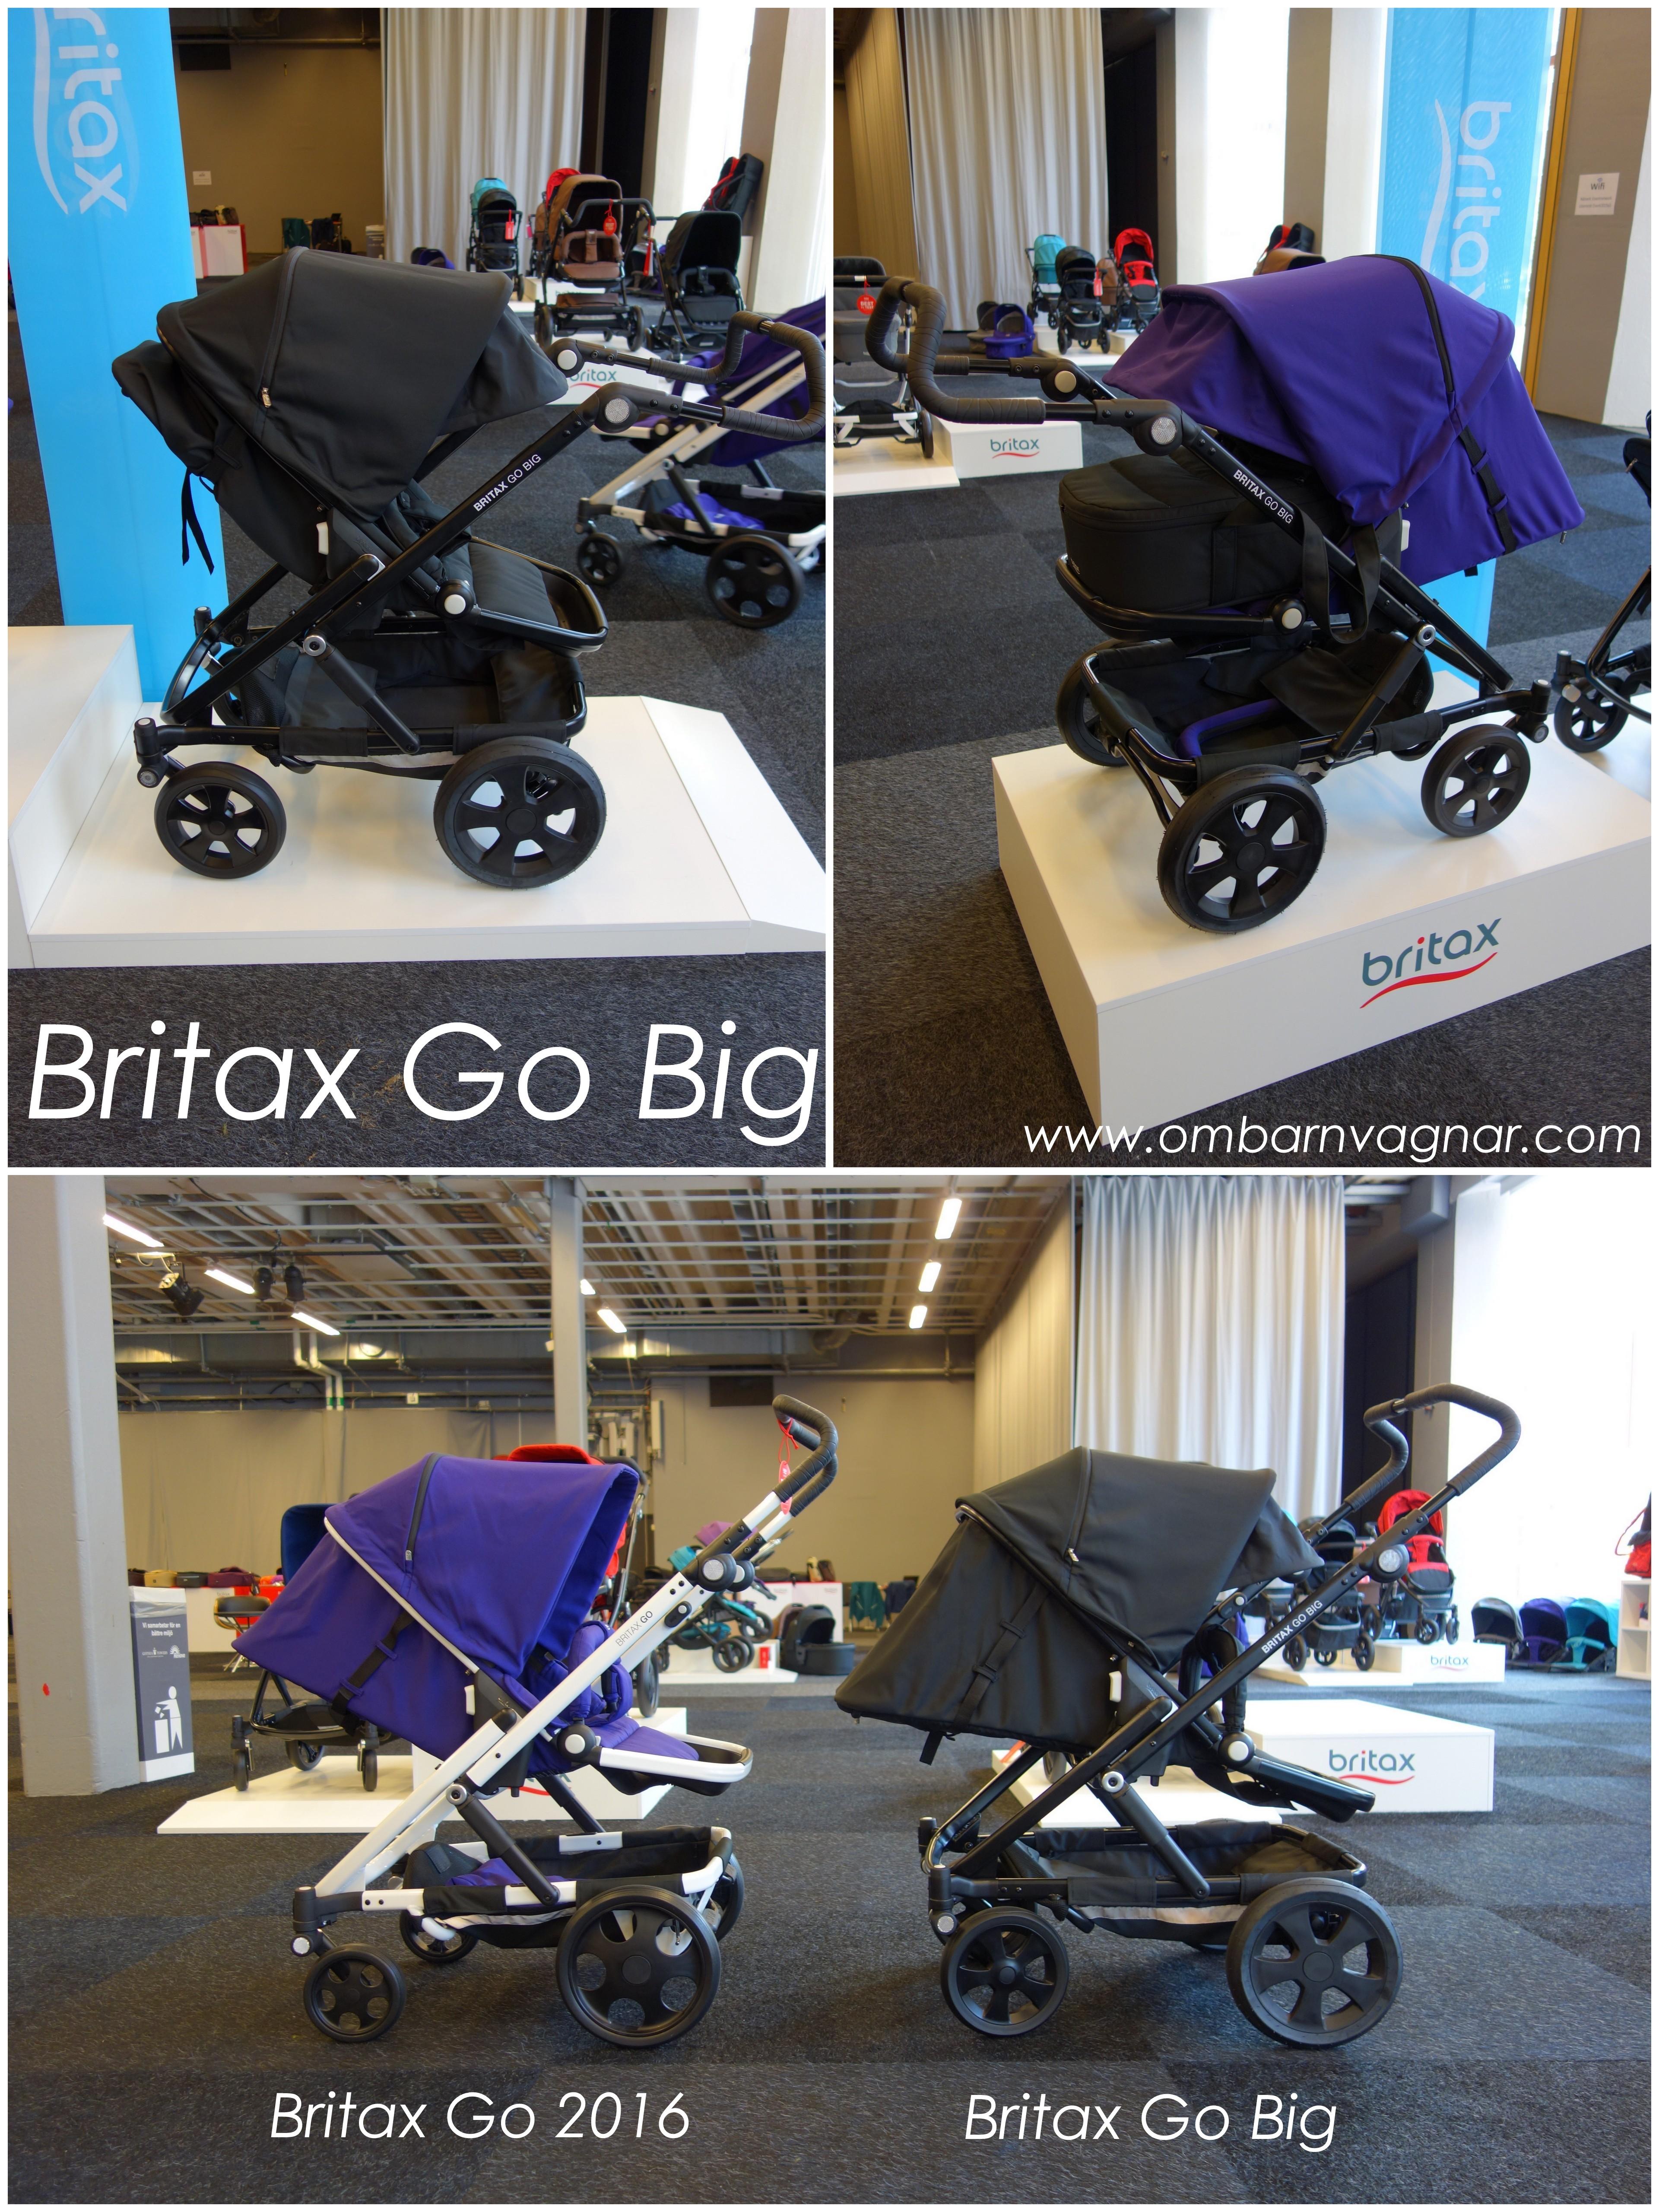 britax 2016 go big or go home allt om barnvagnar. Black Bedroom Furniture Sets. Home Design Ideas